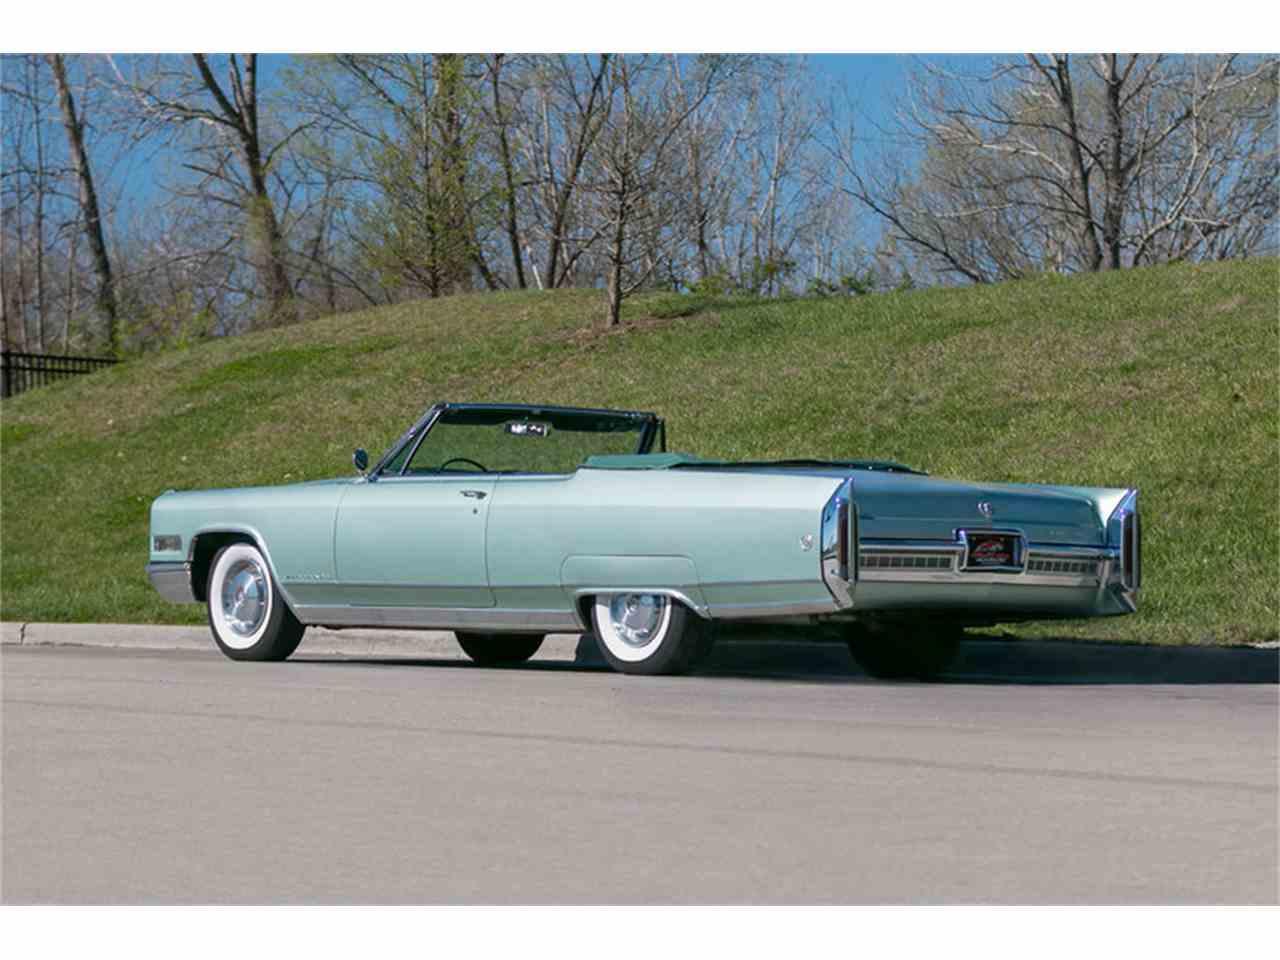 Large Picture of '66 Cadillac Eldorado located in Missouri - $49,995.00 - LSH1